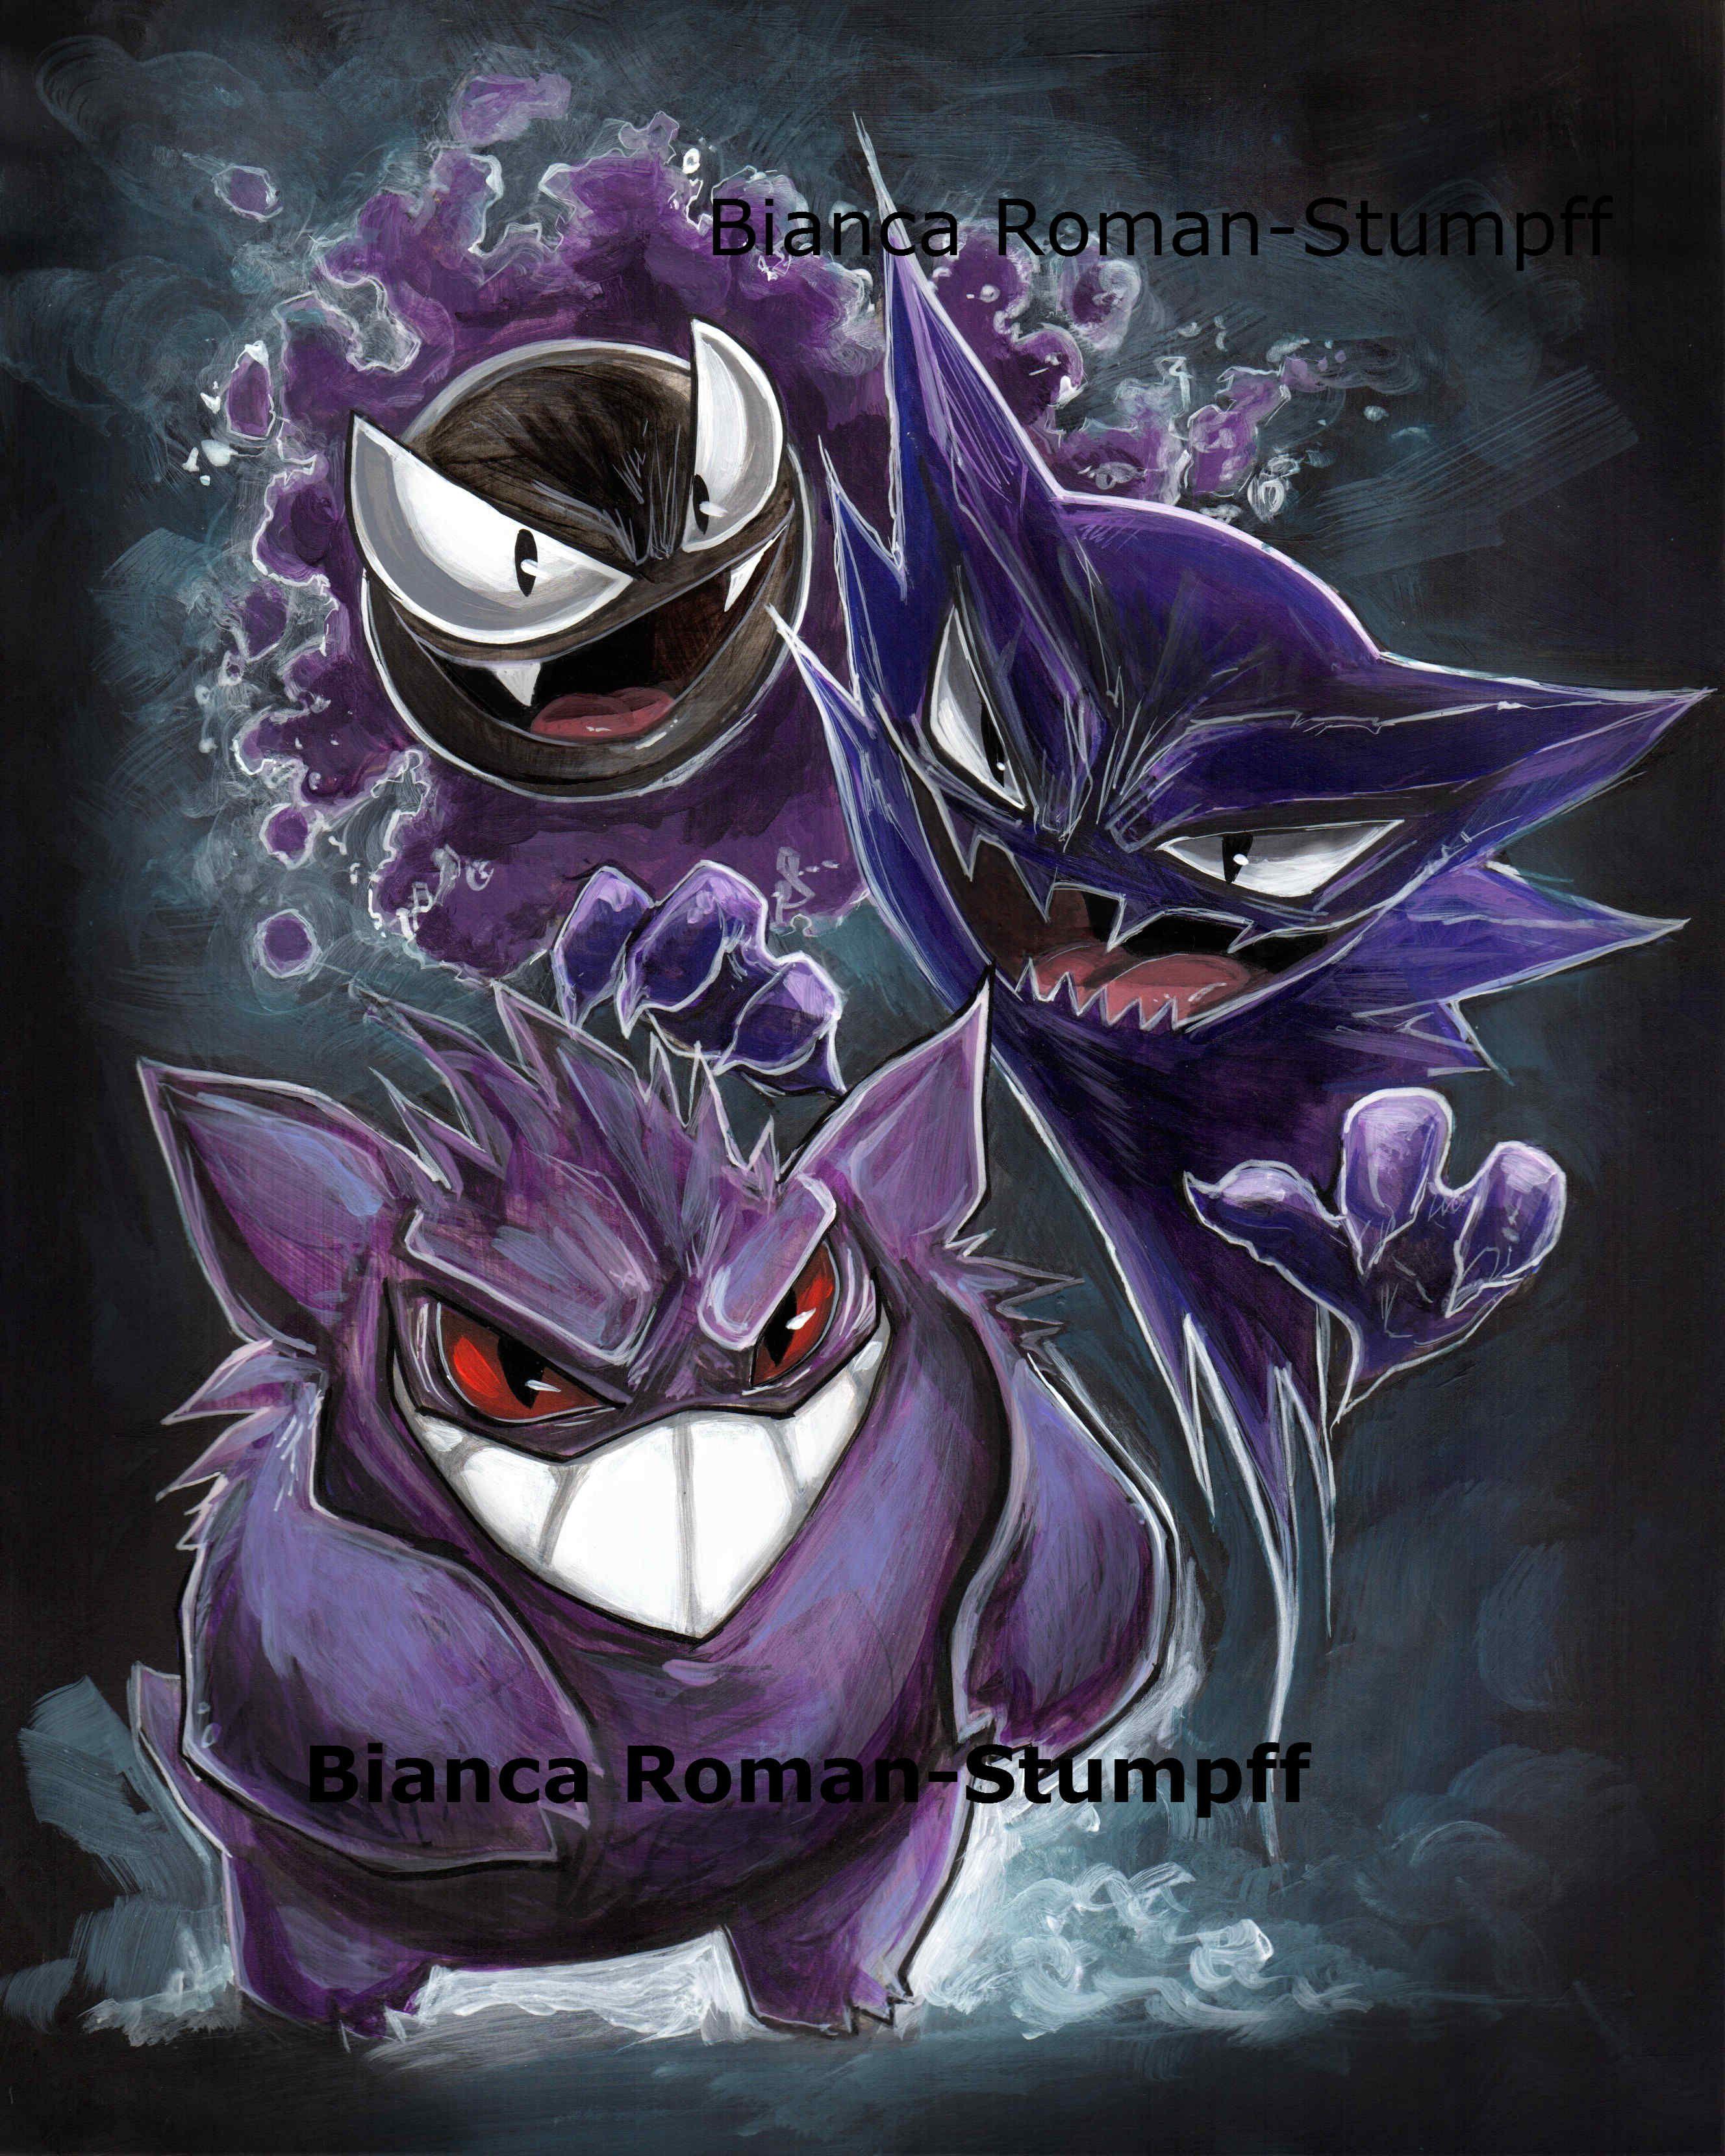 N and touko wedding - The Og Original Ghosts Print Art Of Bianca Roman Stumpff Online